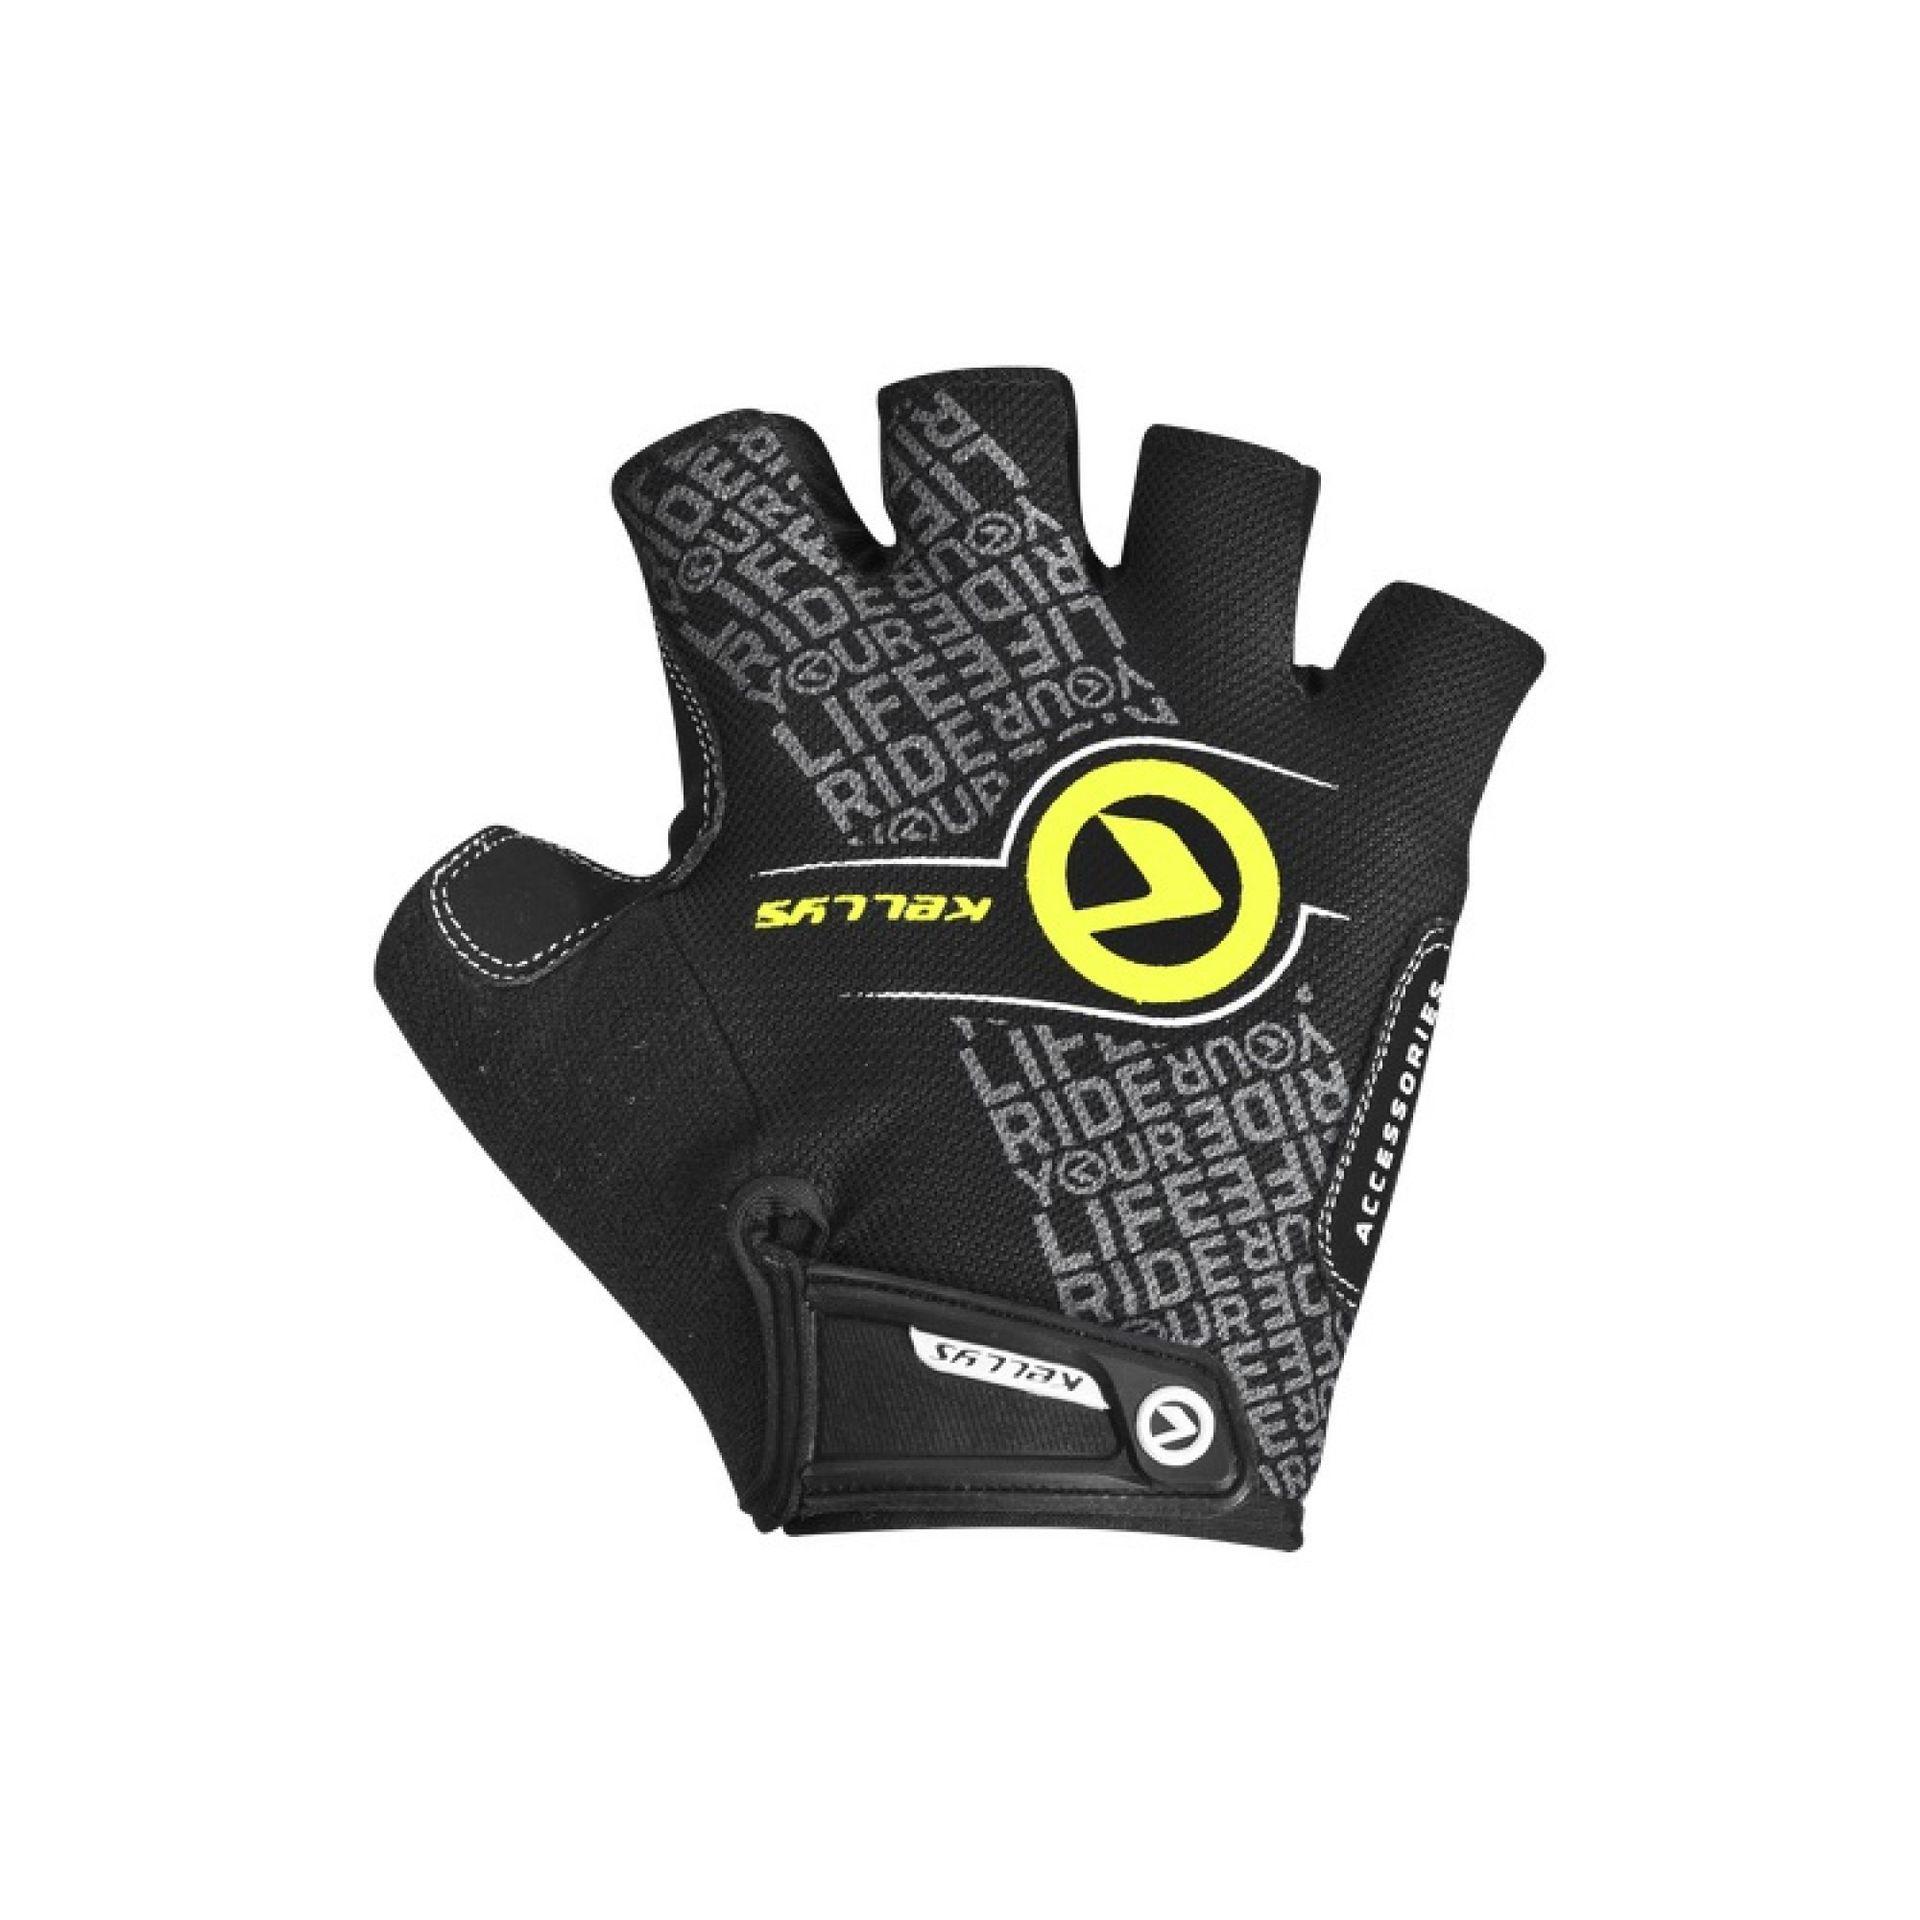 Rękawiczki rowerowe Kellys Comfort New czarne limonkowe